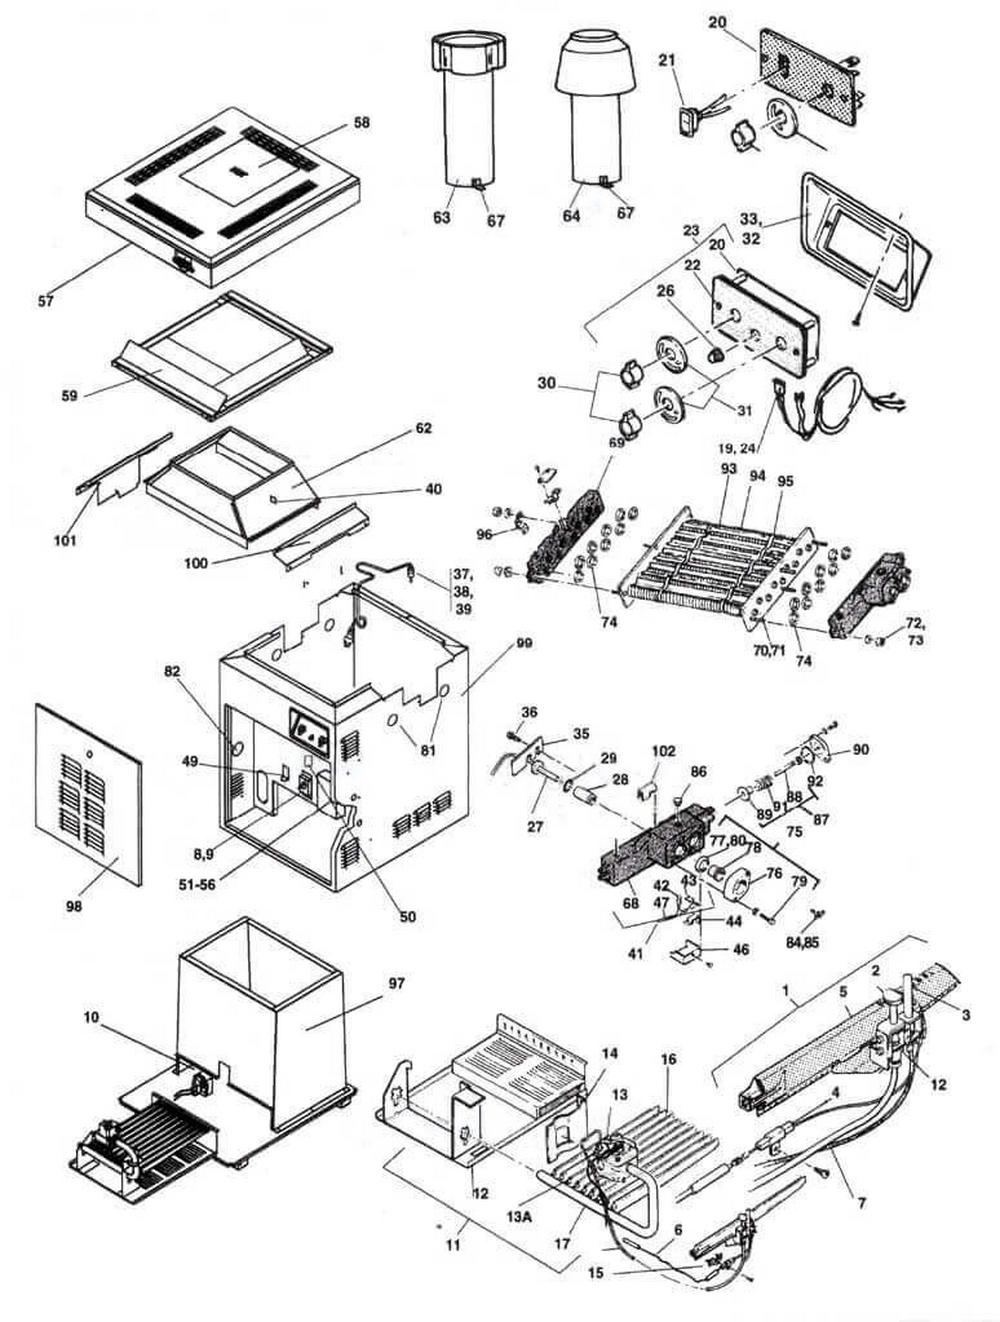 Laars Lite2 LD/LG Heaters 2003-Present - Pg 1 image